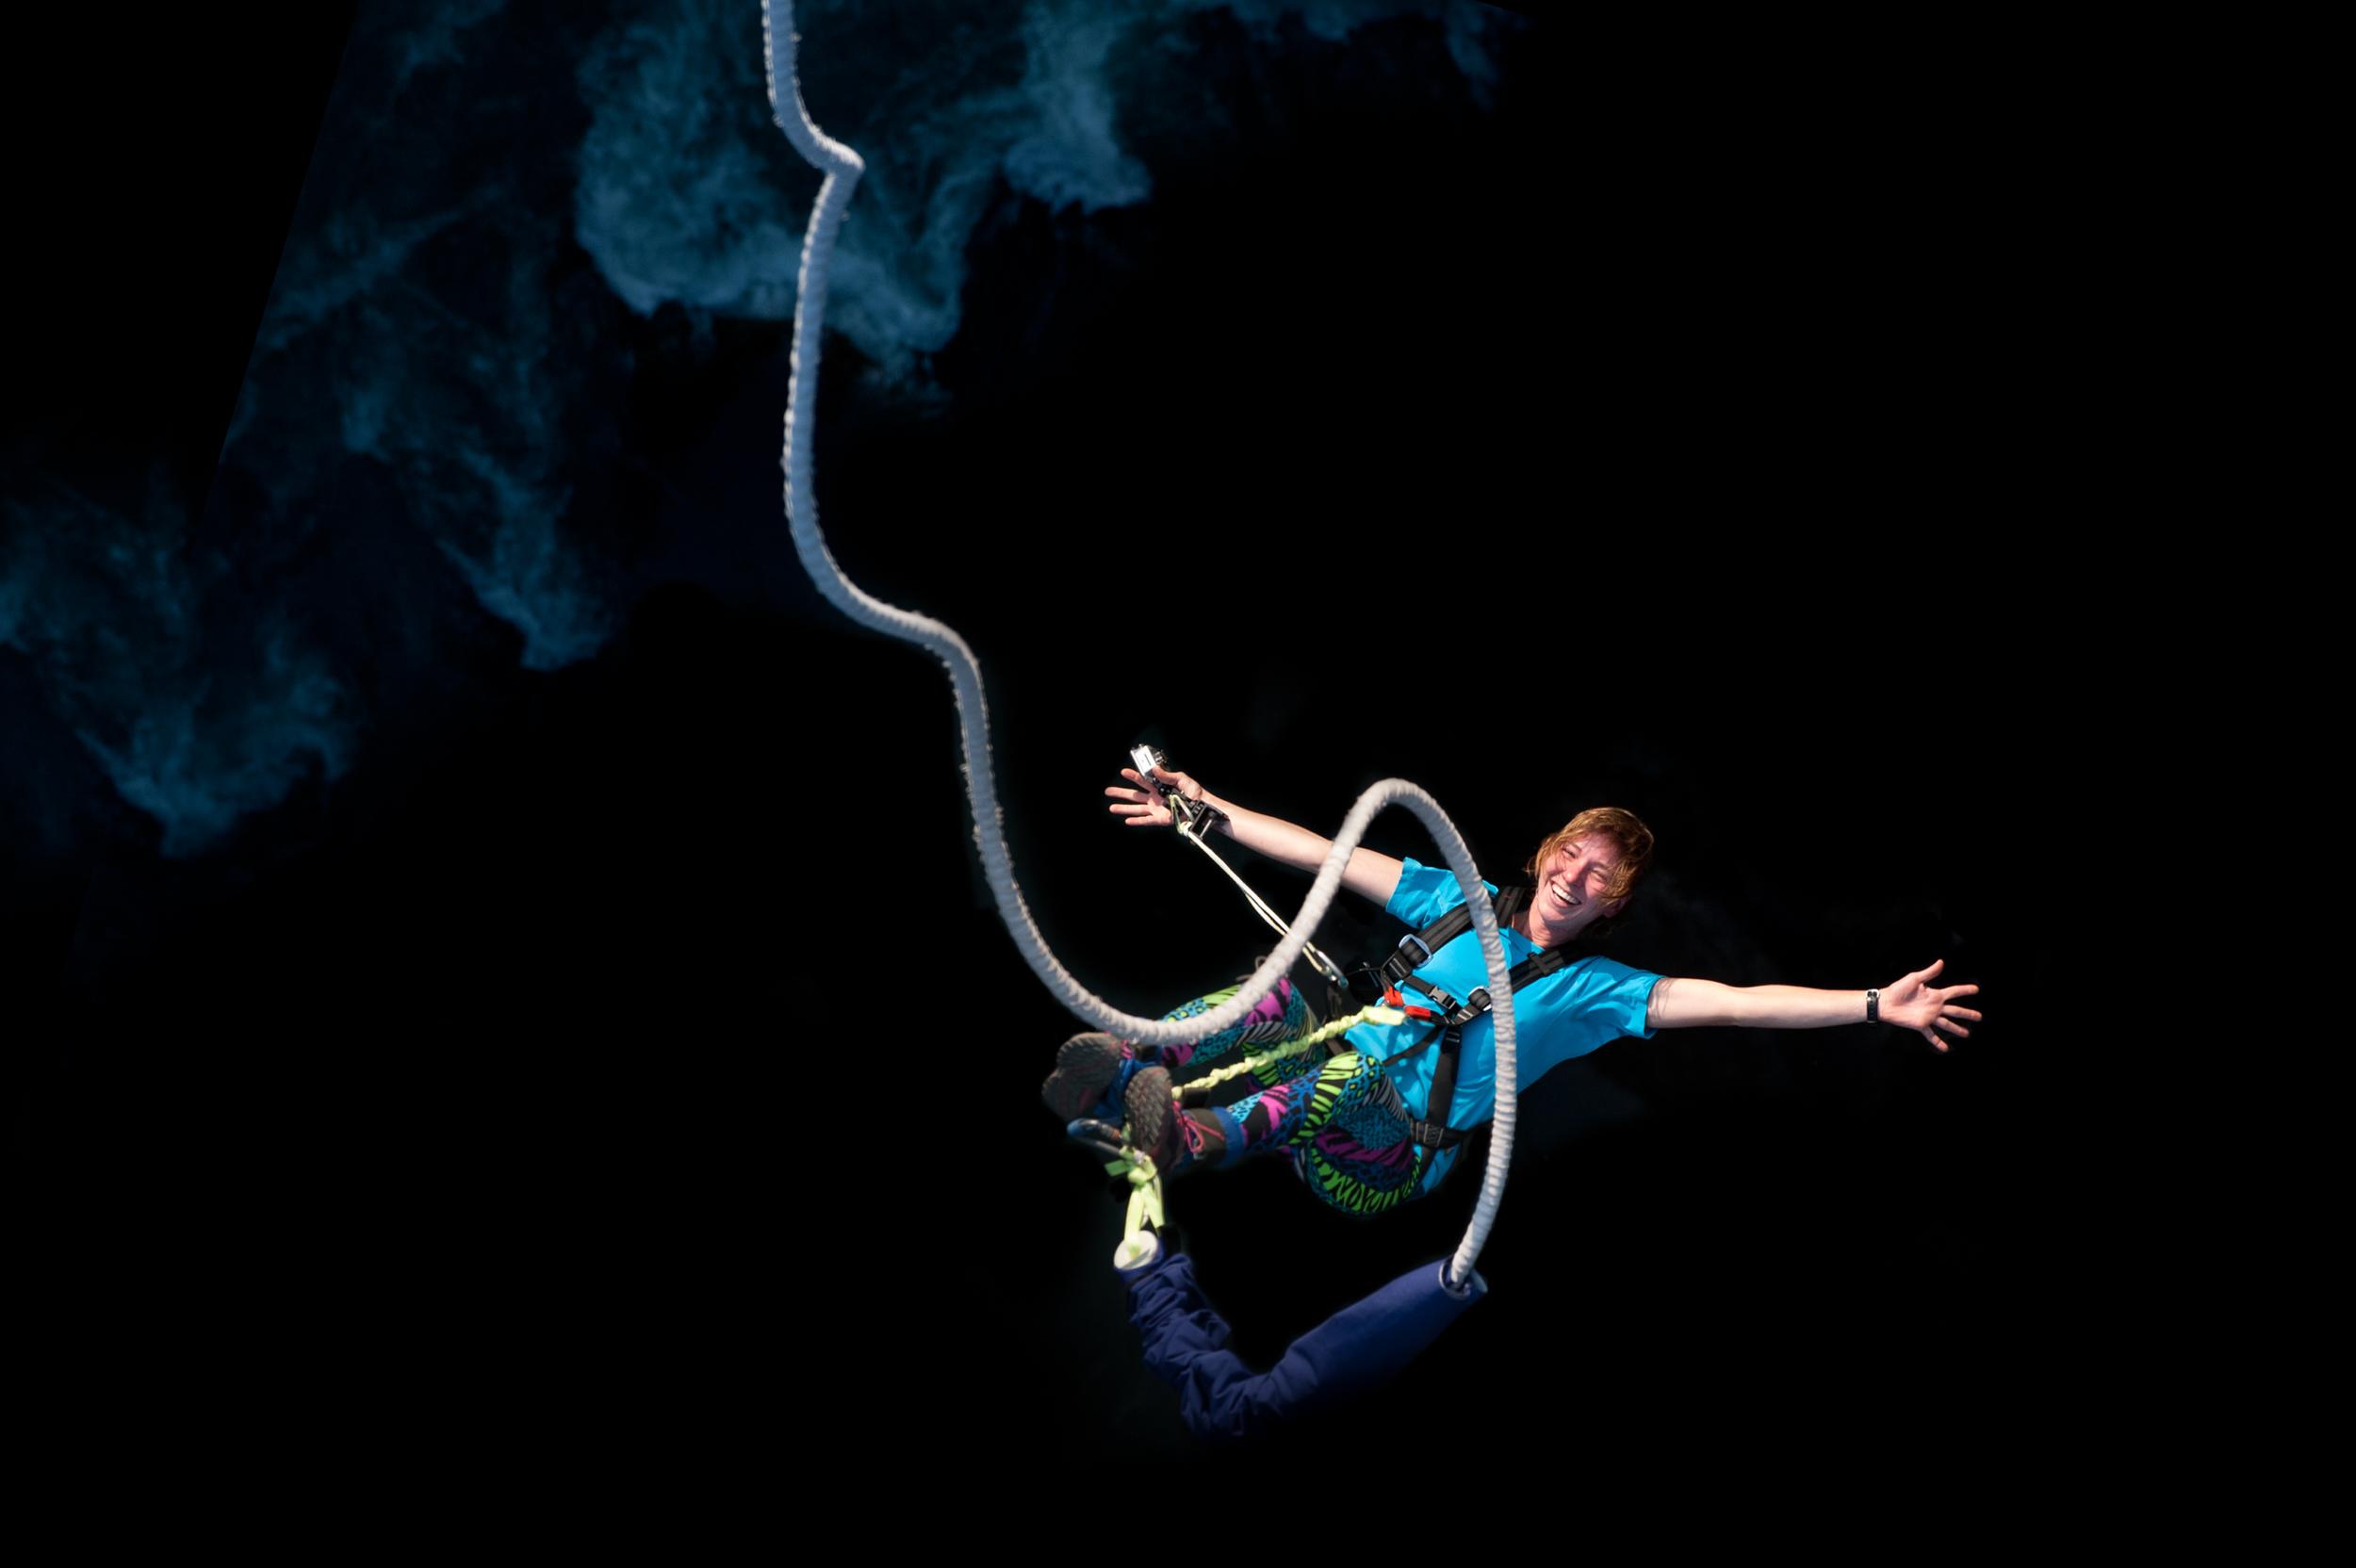 Bungy jumping _DSC9414-edit-Edit-2.jpg